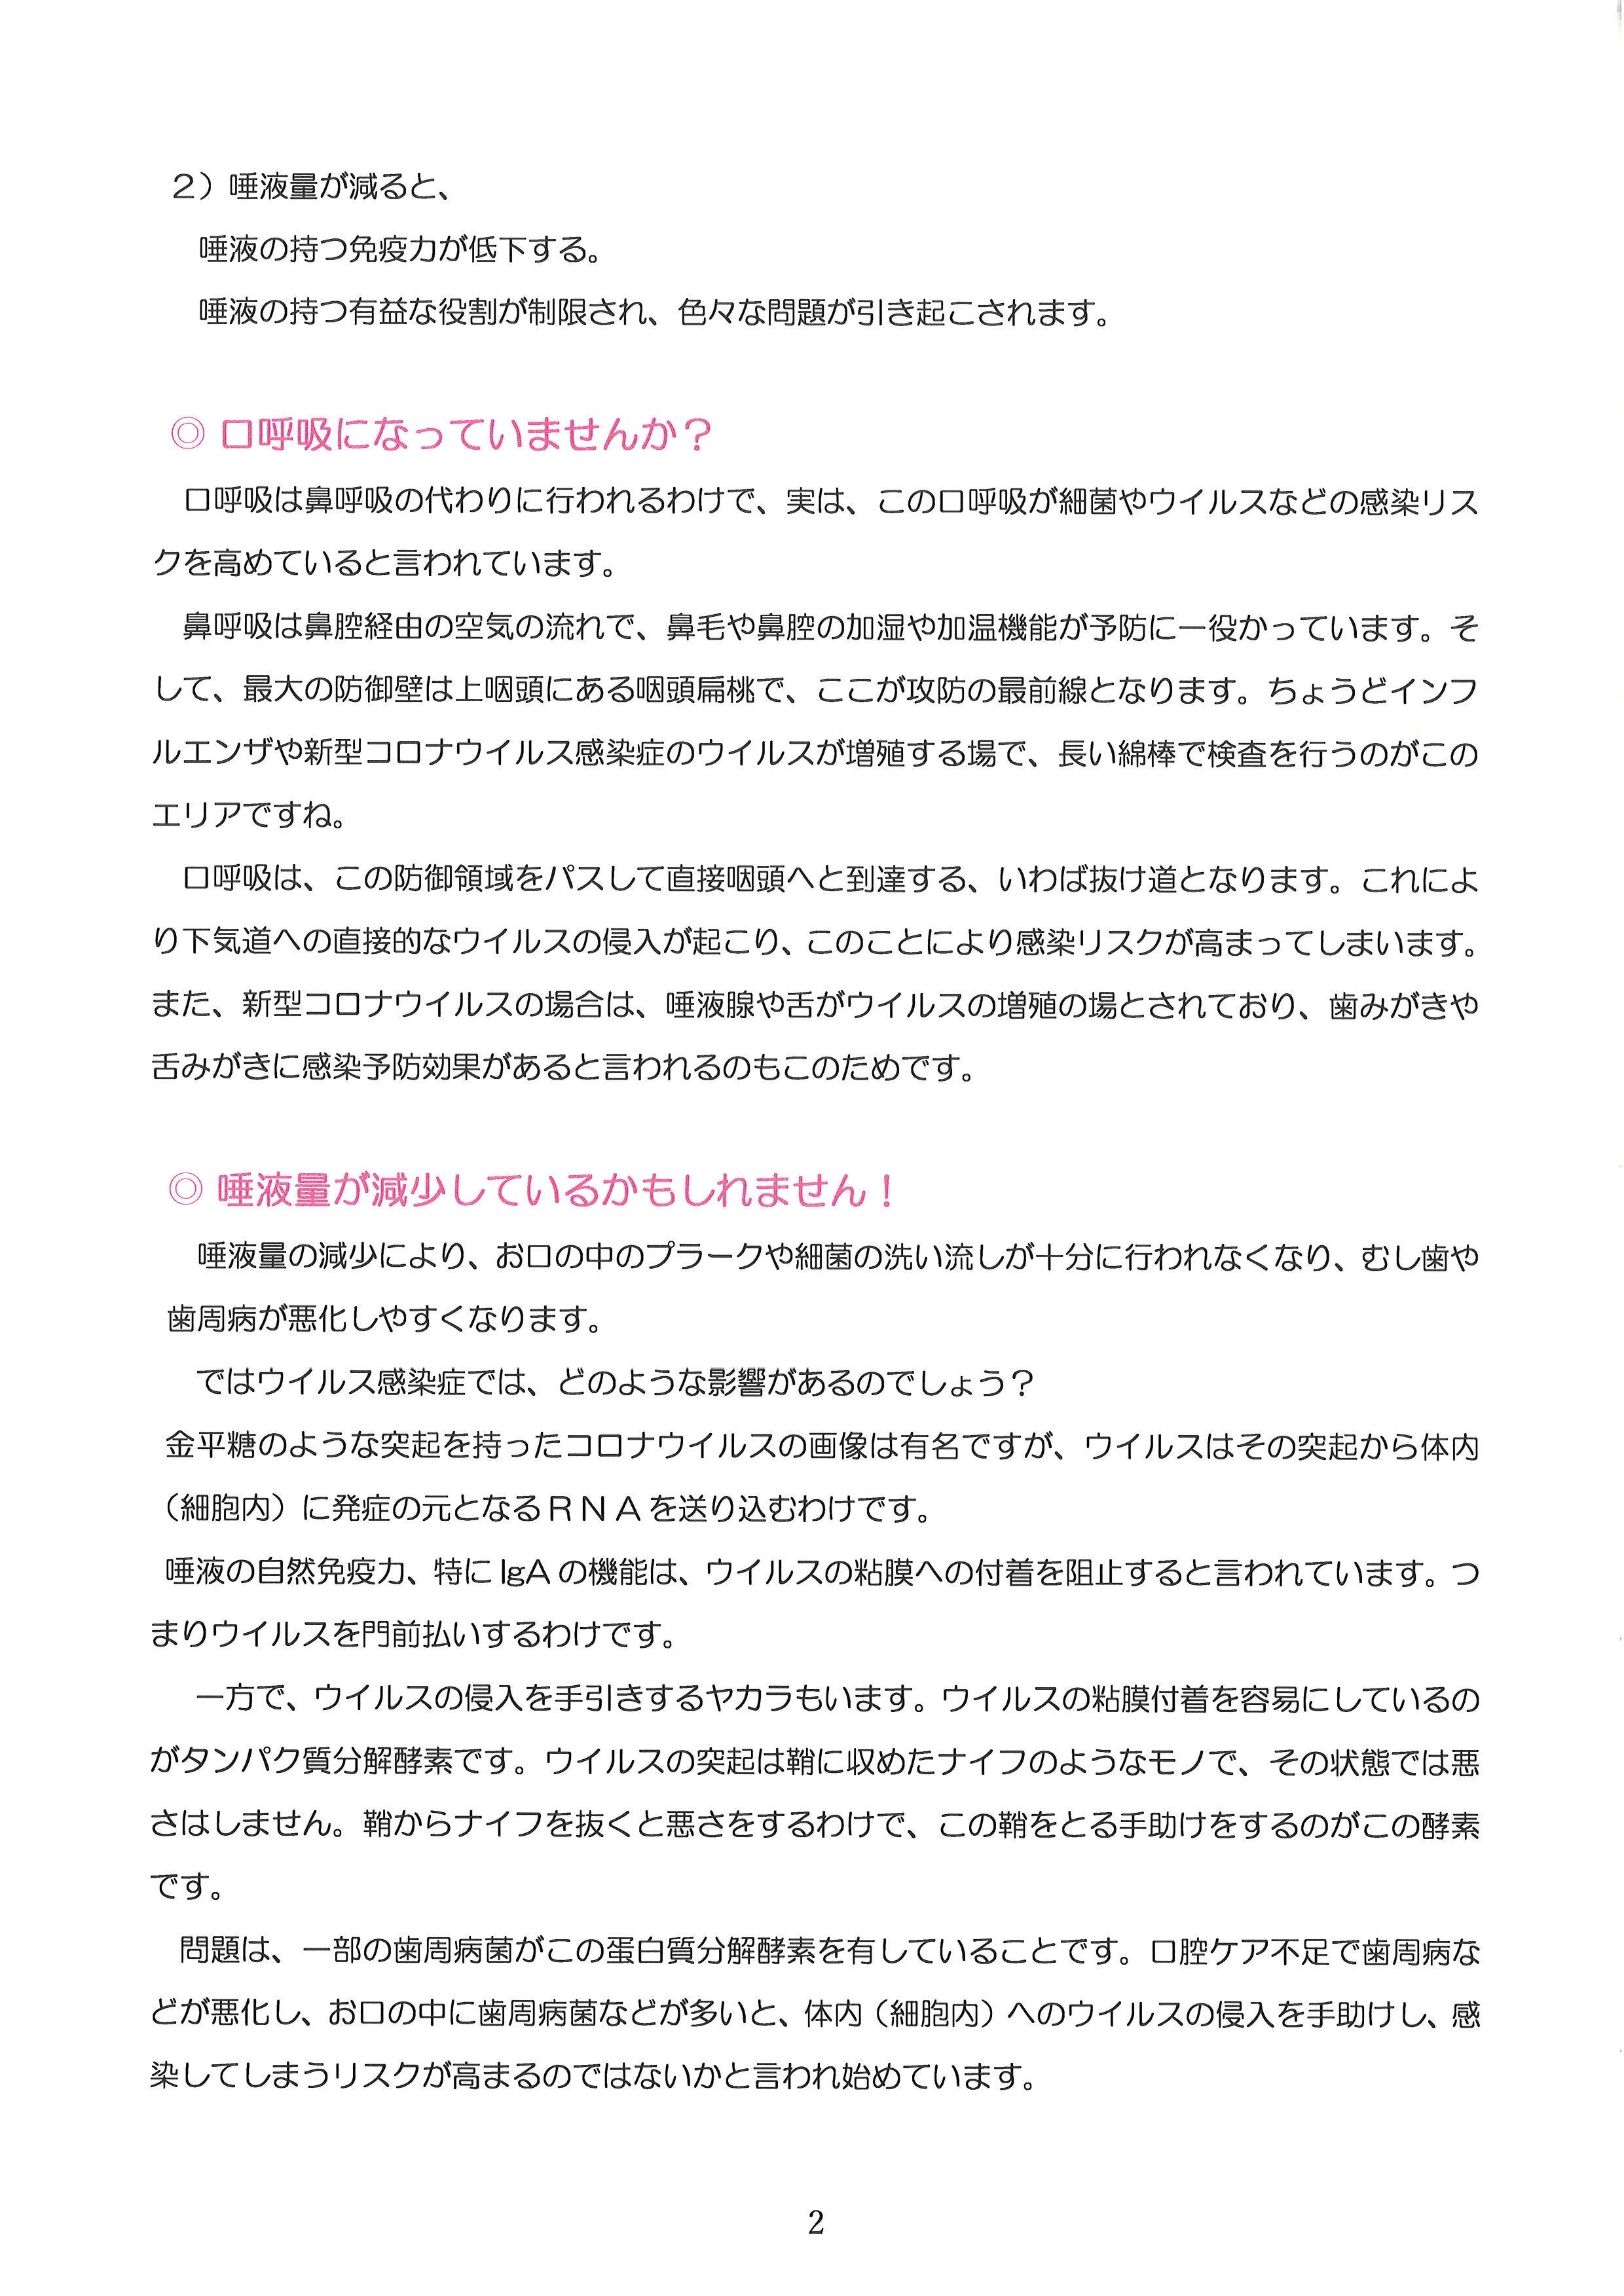 https://www.suminasu.or.jp/global-data/20210514154325752.jpg